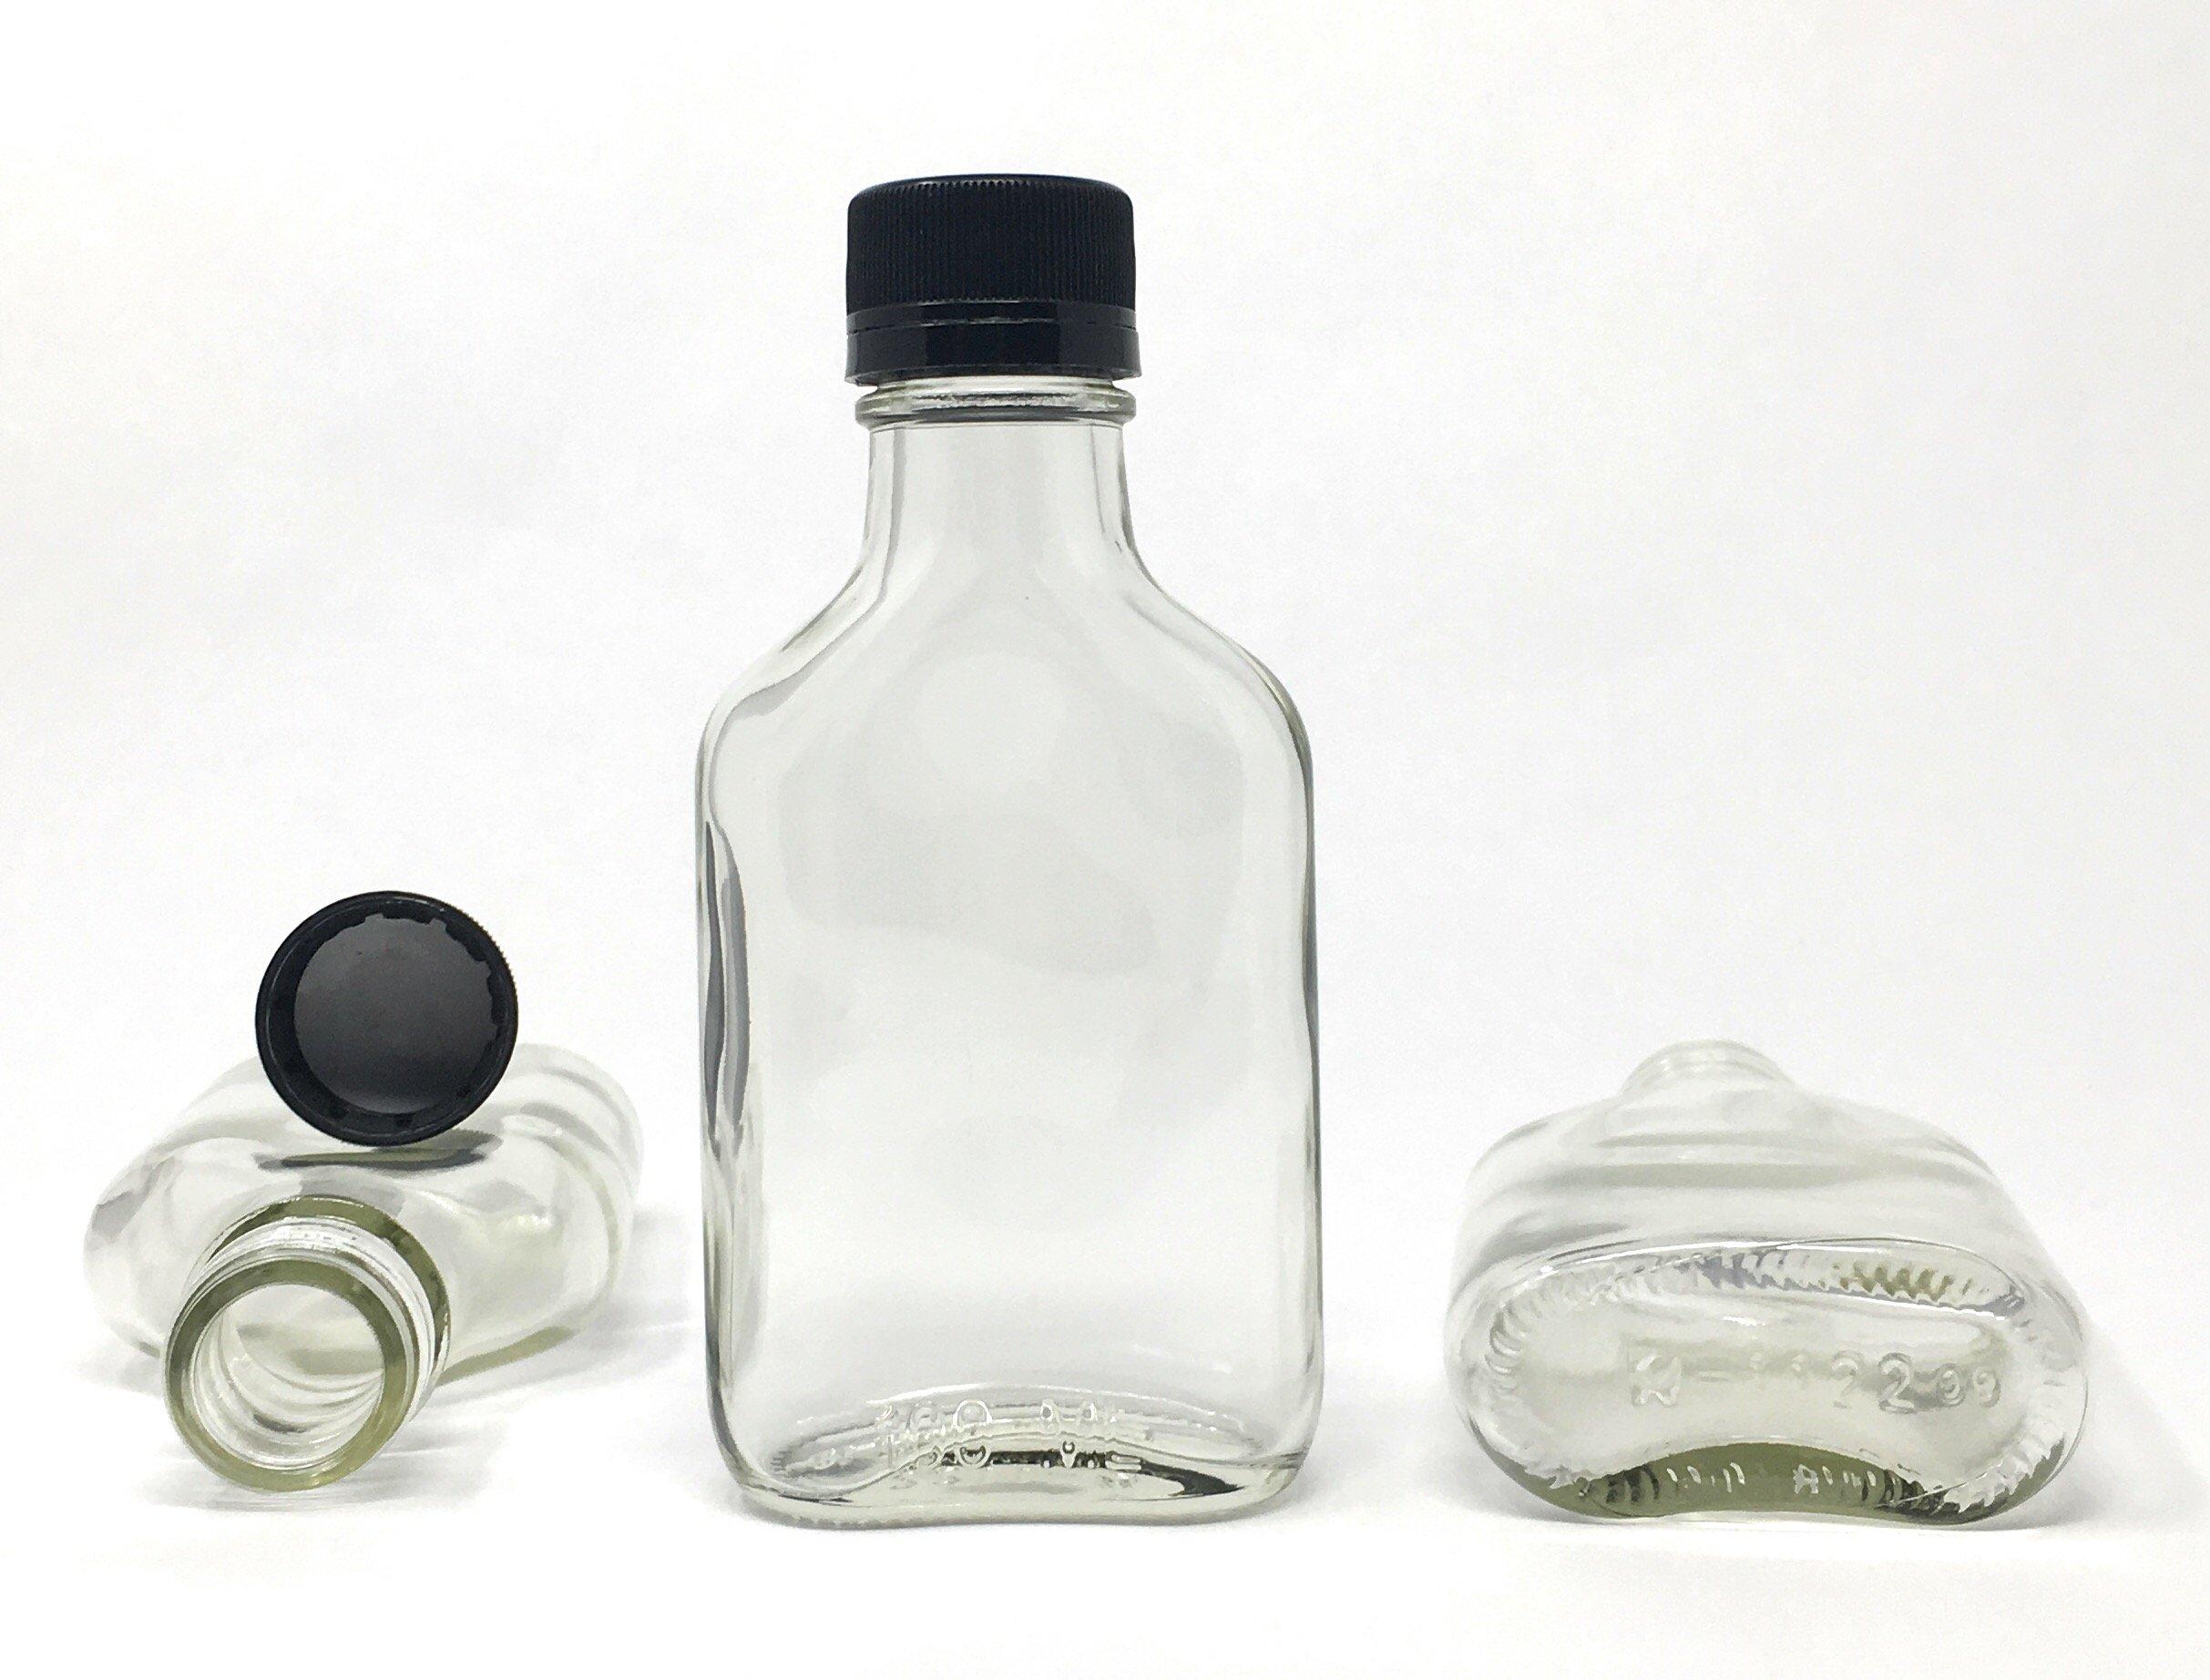 100 ml (3.3 oz) Glass Flask Liquor Bottle with Black Caps (12 Pack)